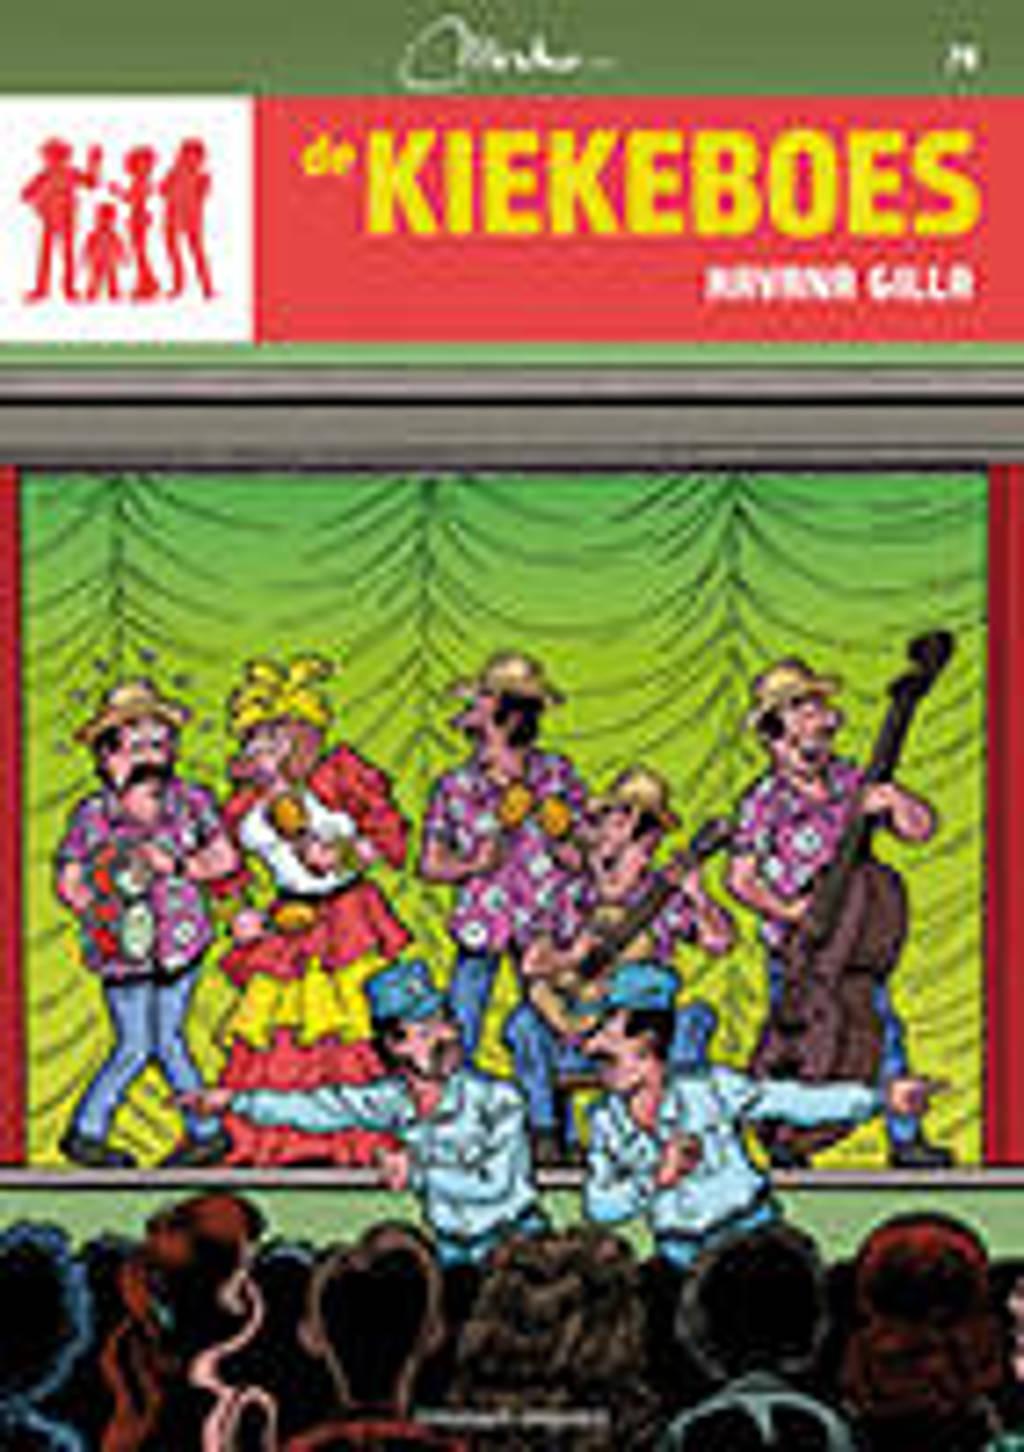 Kiekeboe: De Kiekeboes Havana gilla - Merho